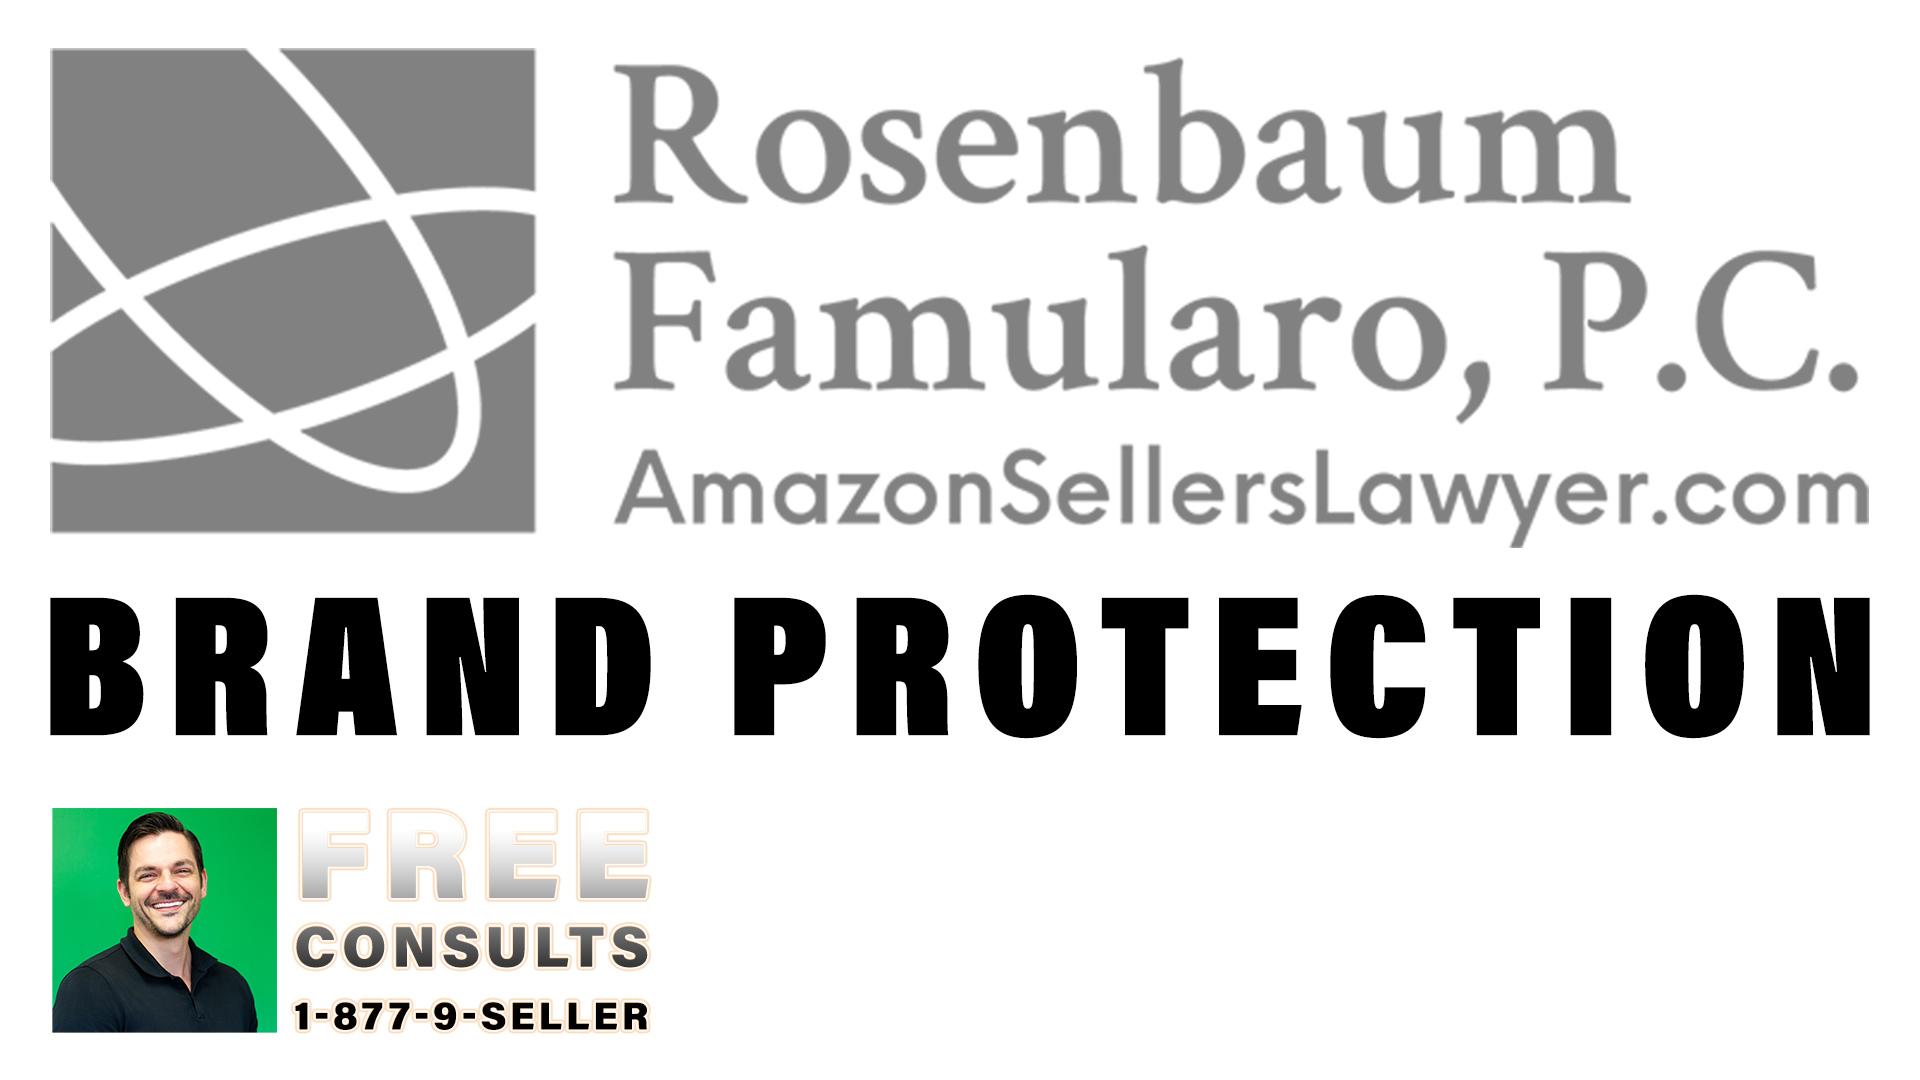 brand protection on Amazon